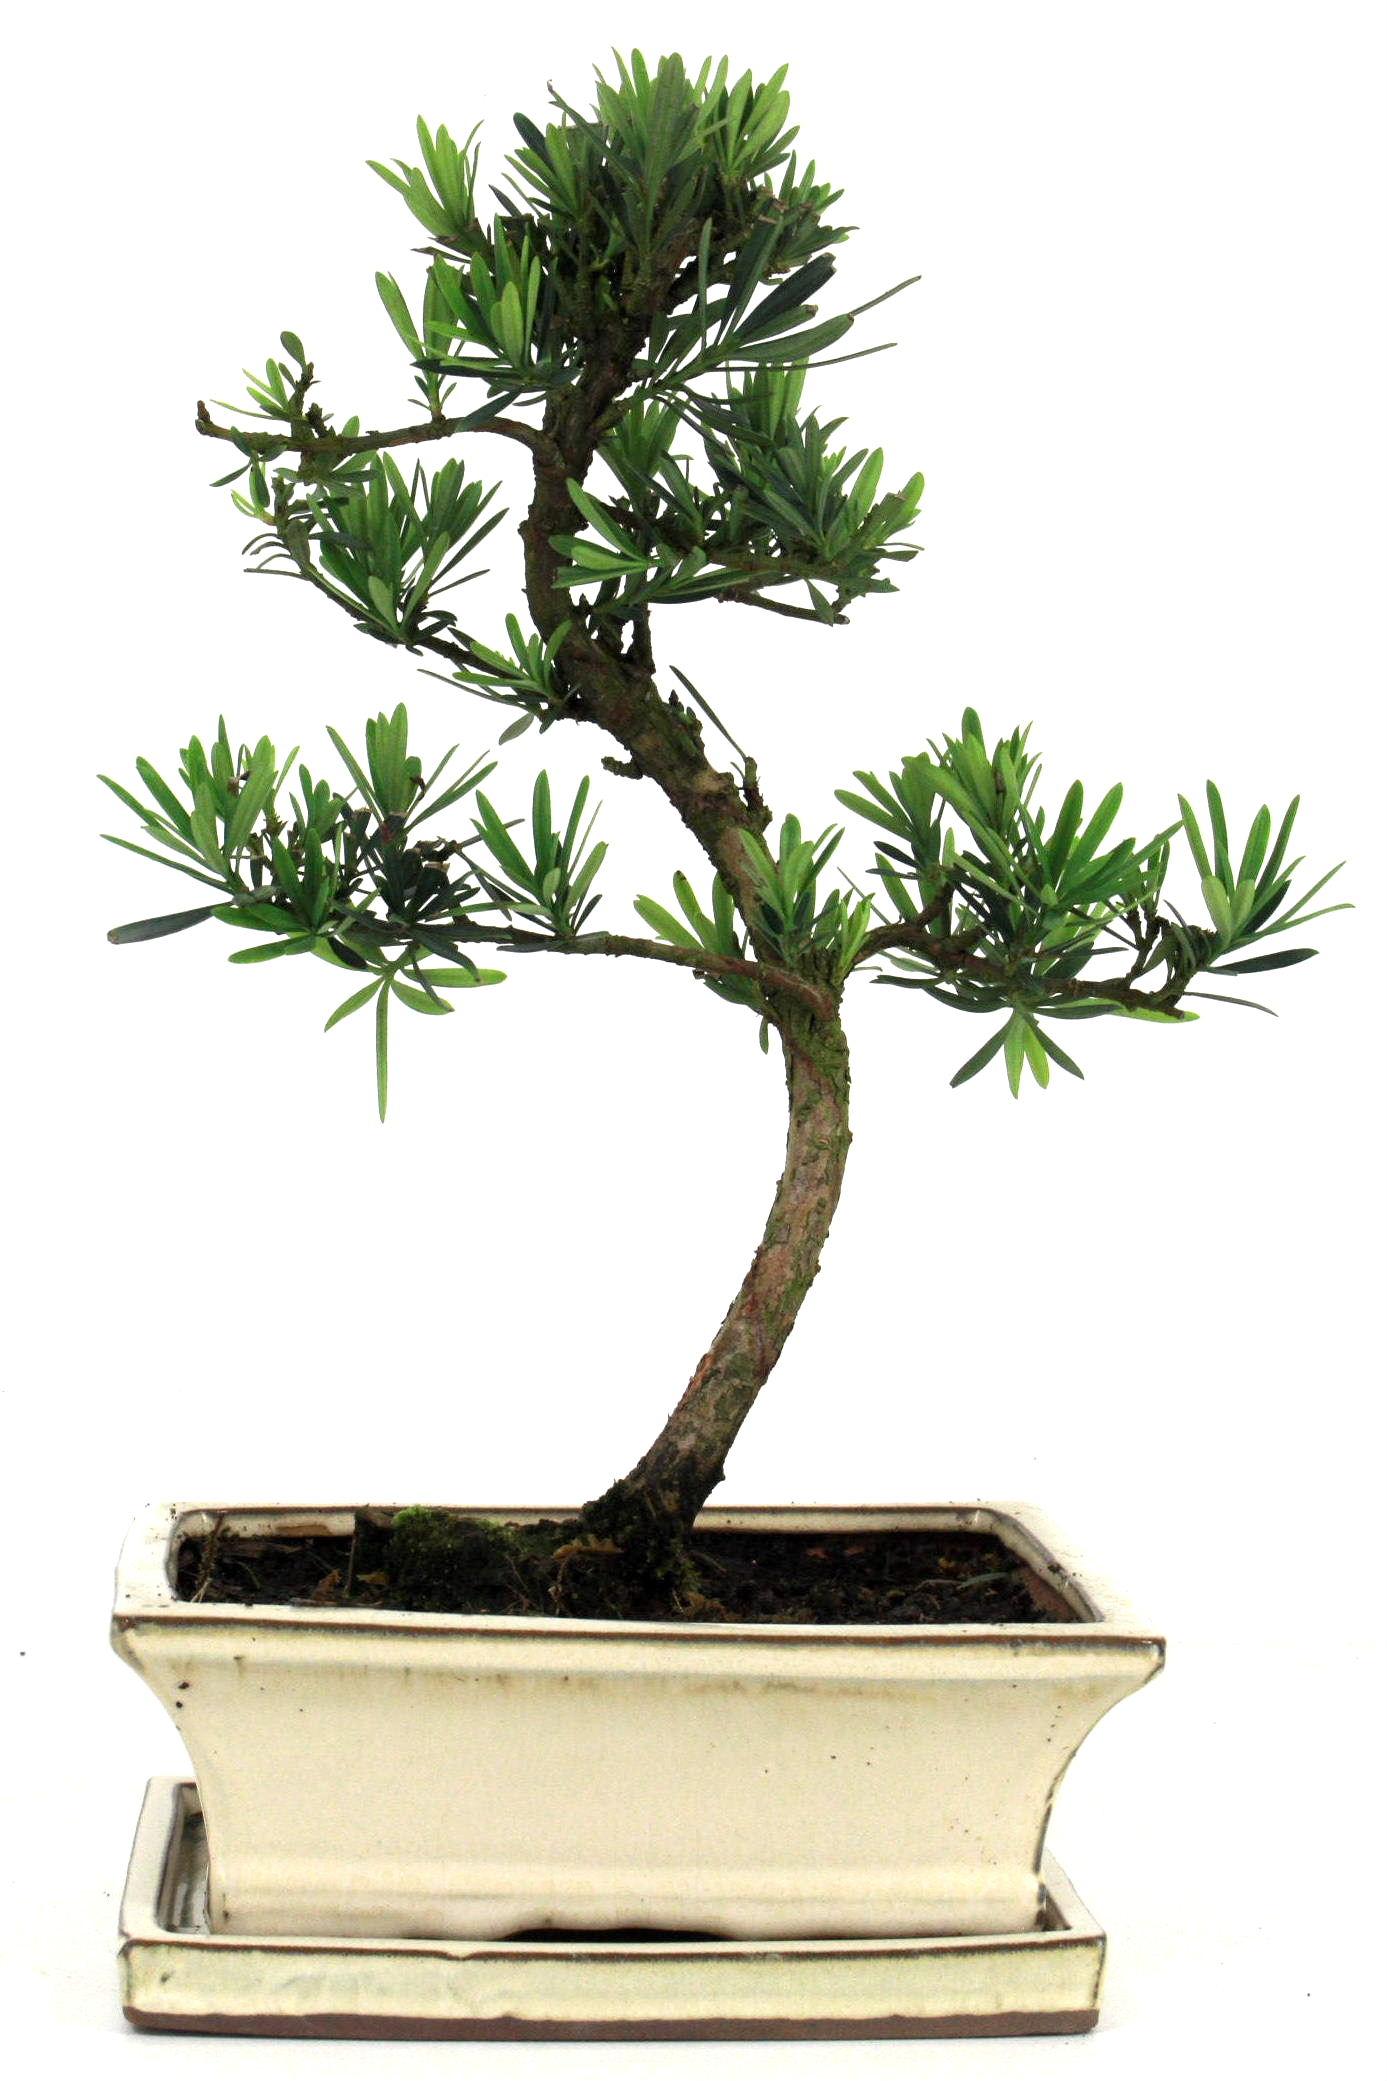 steineibe bonsai 35 40 cm 1939 bei oyaki bonsai kaufen. Black Bedroom Furniture Sets. Home Design Ideas